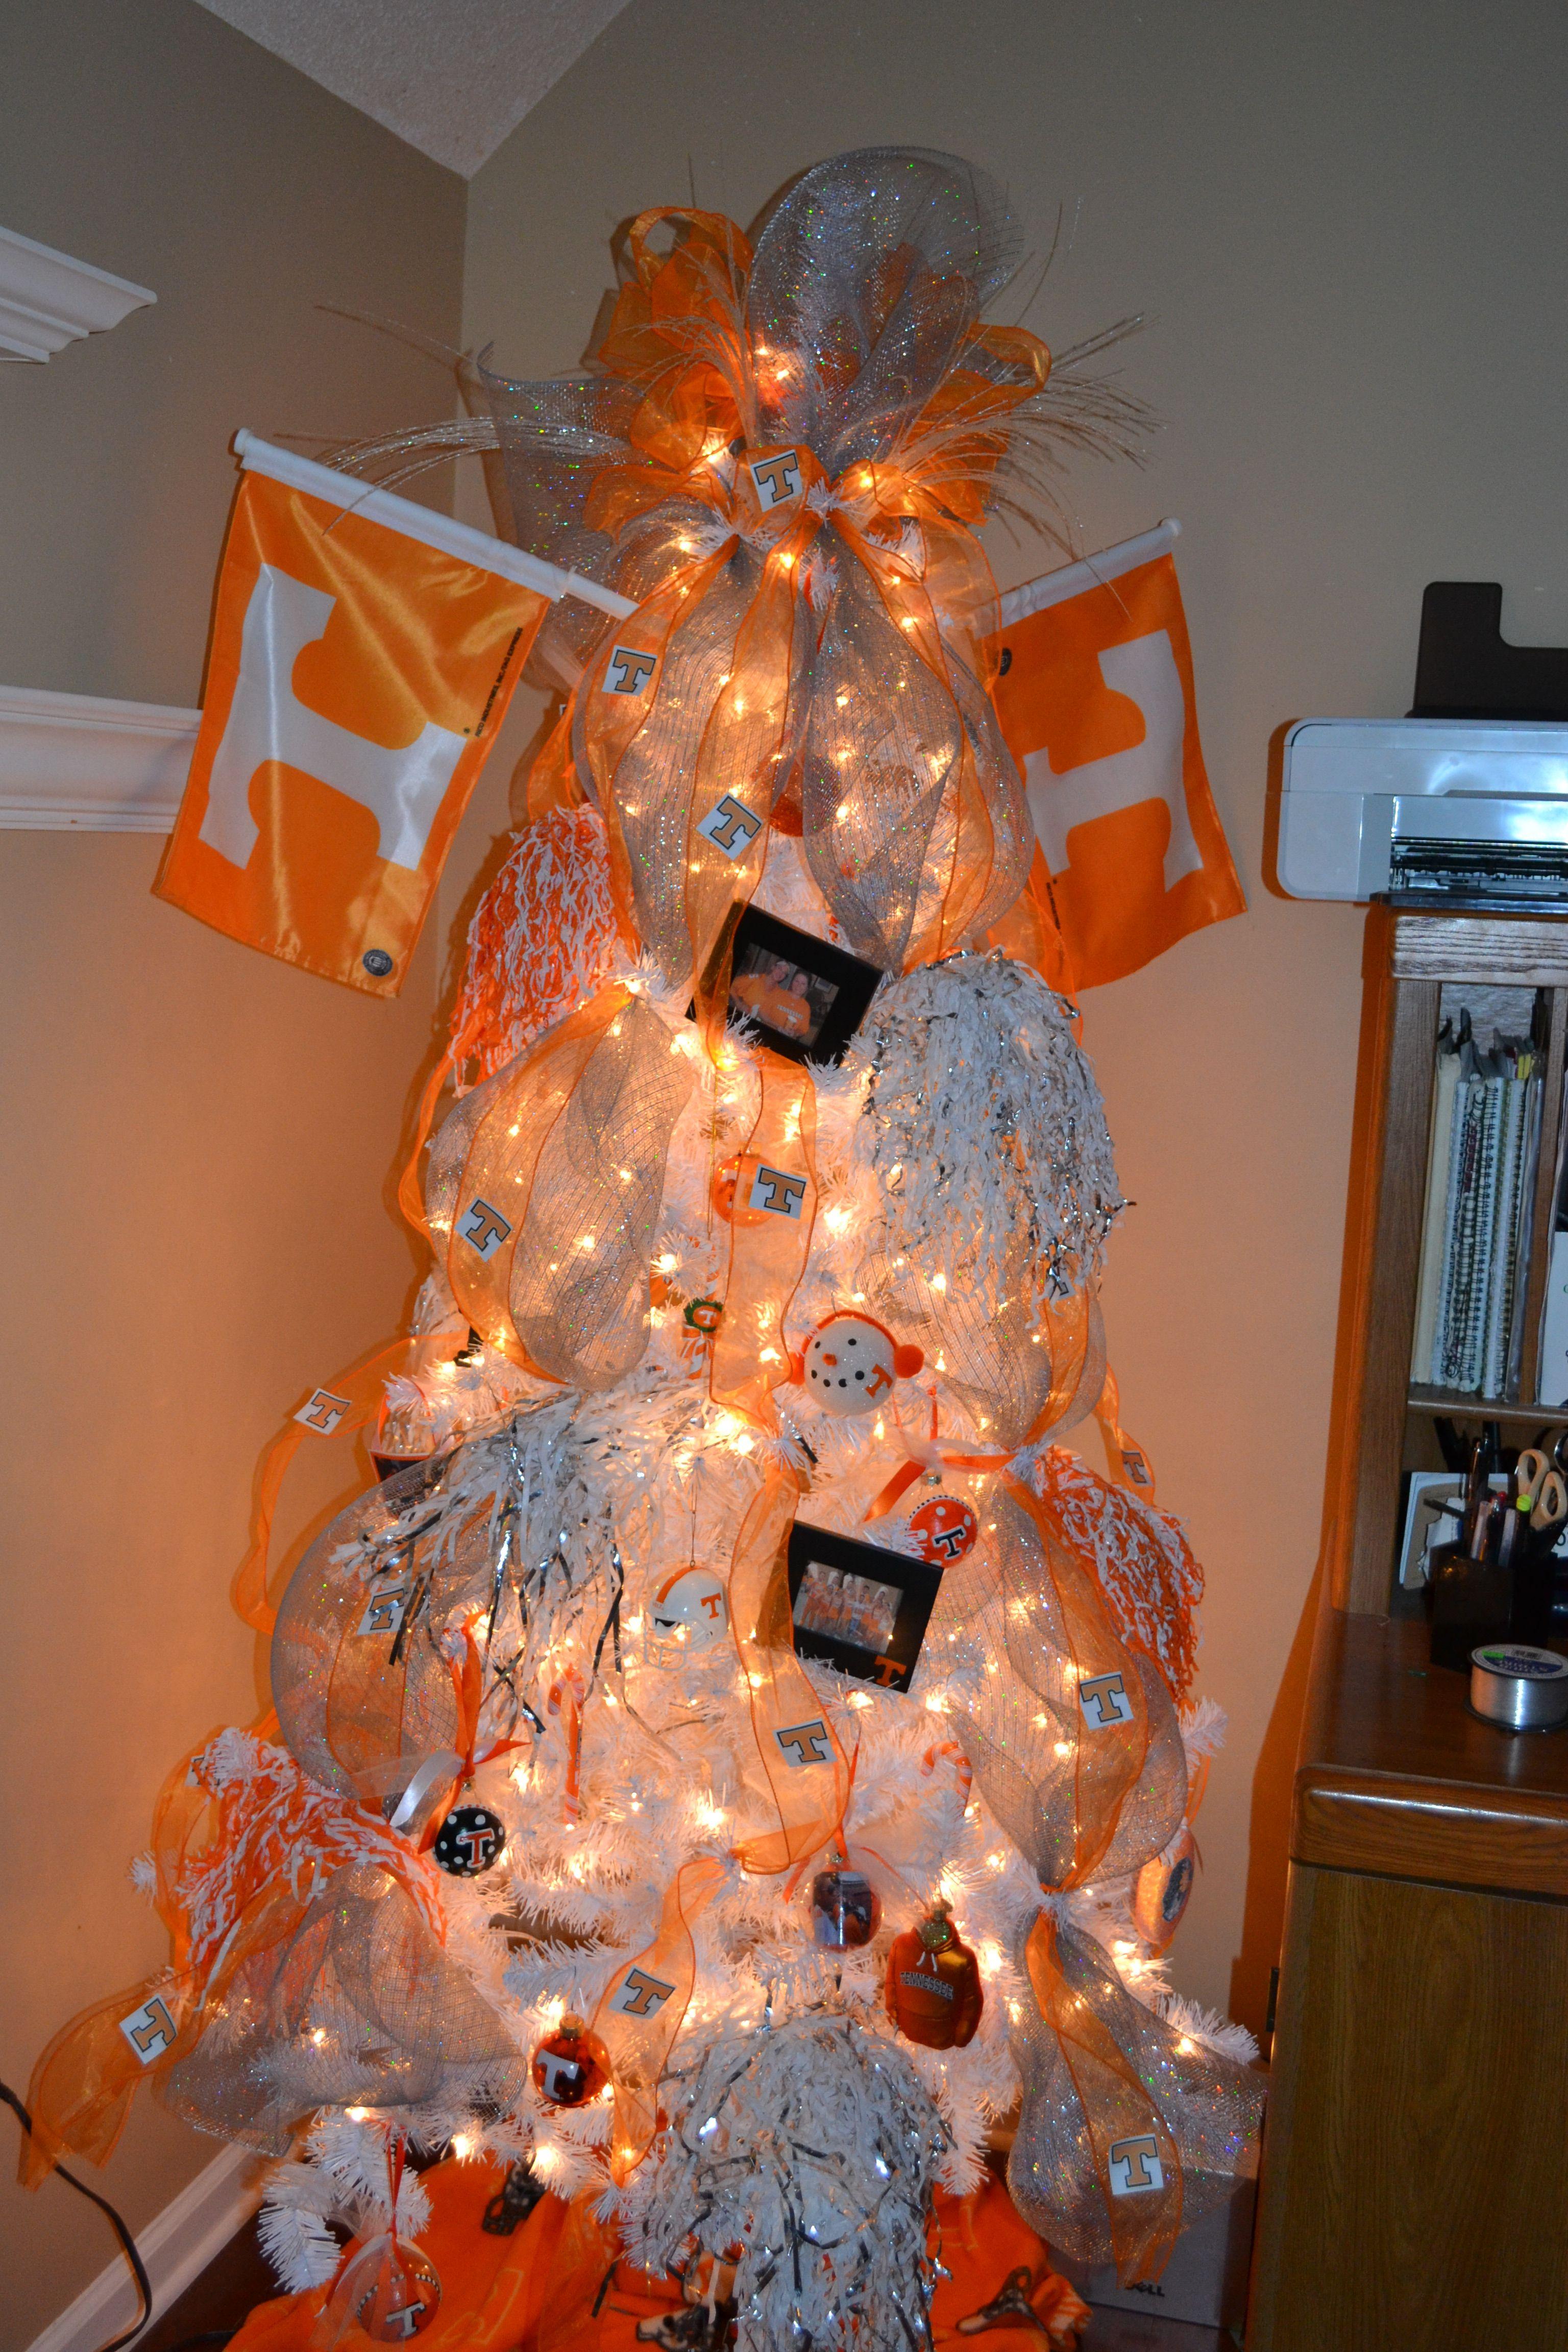 TN Vol tree in the office.